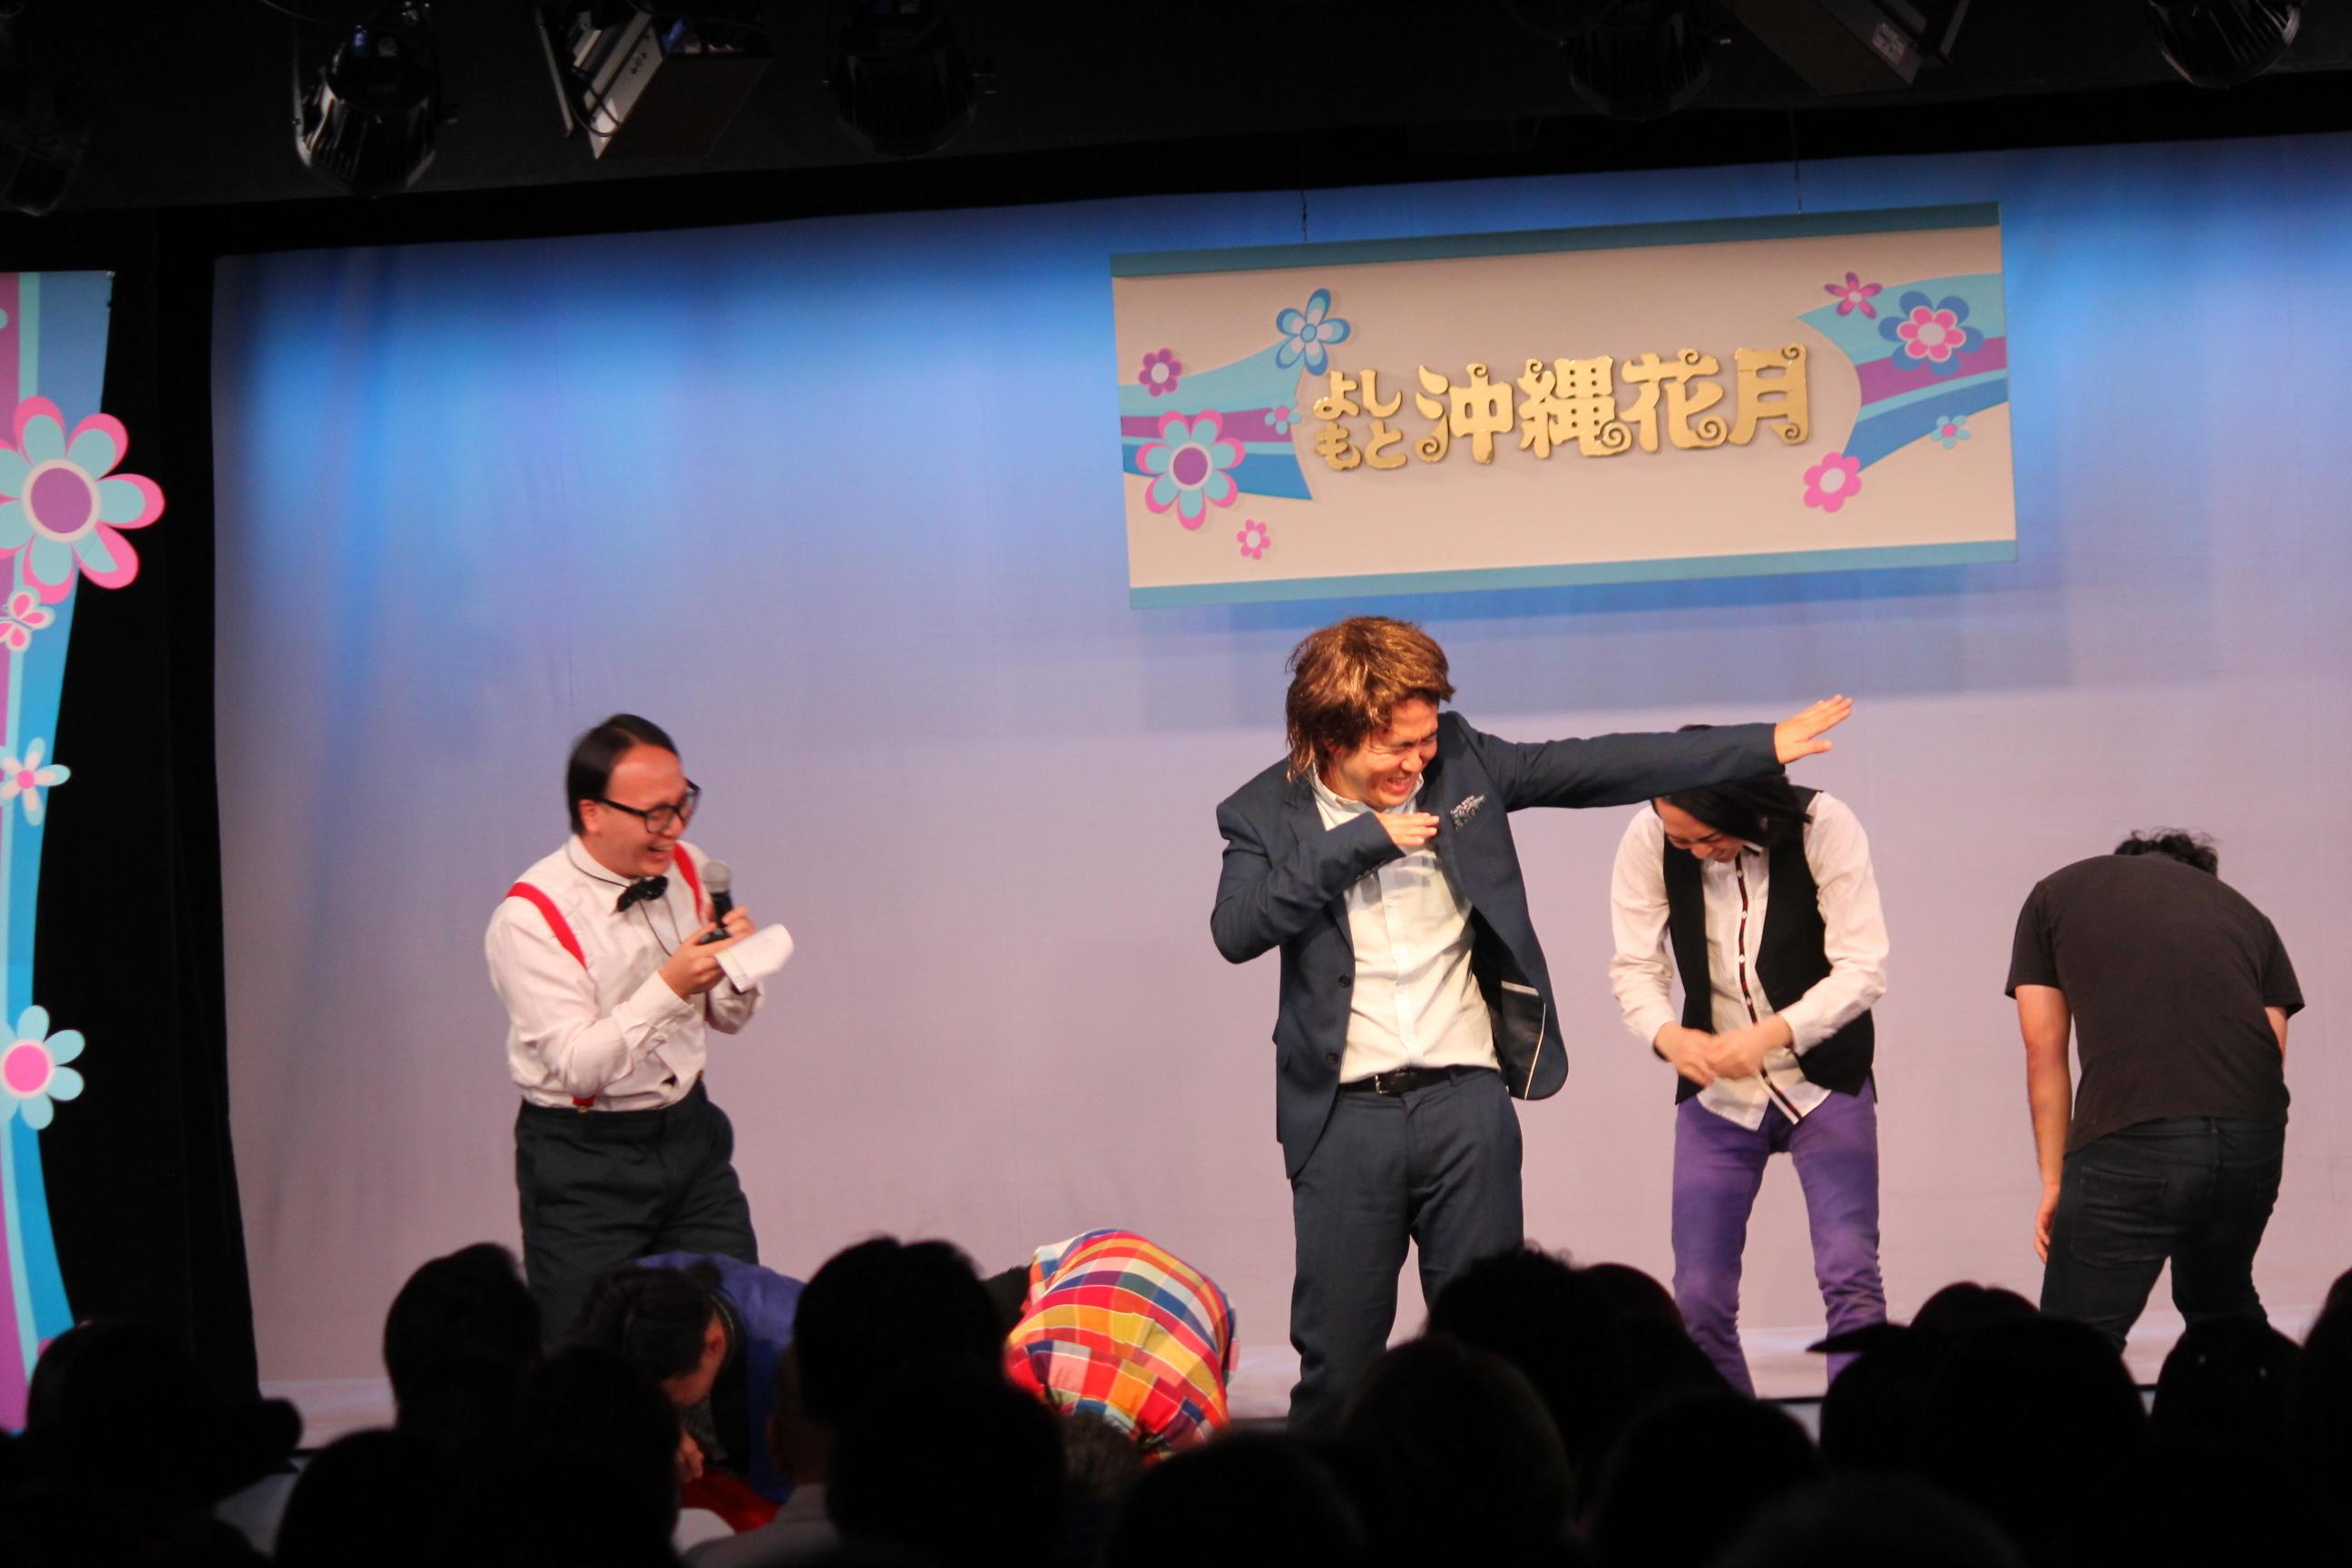 http://news.yoshimoto.co.jp/20151201143029-8e6e8061522451ea8251df27c00a8412464b3042.jpg